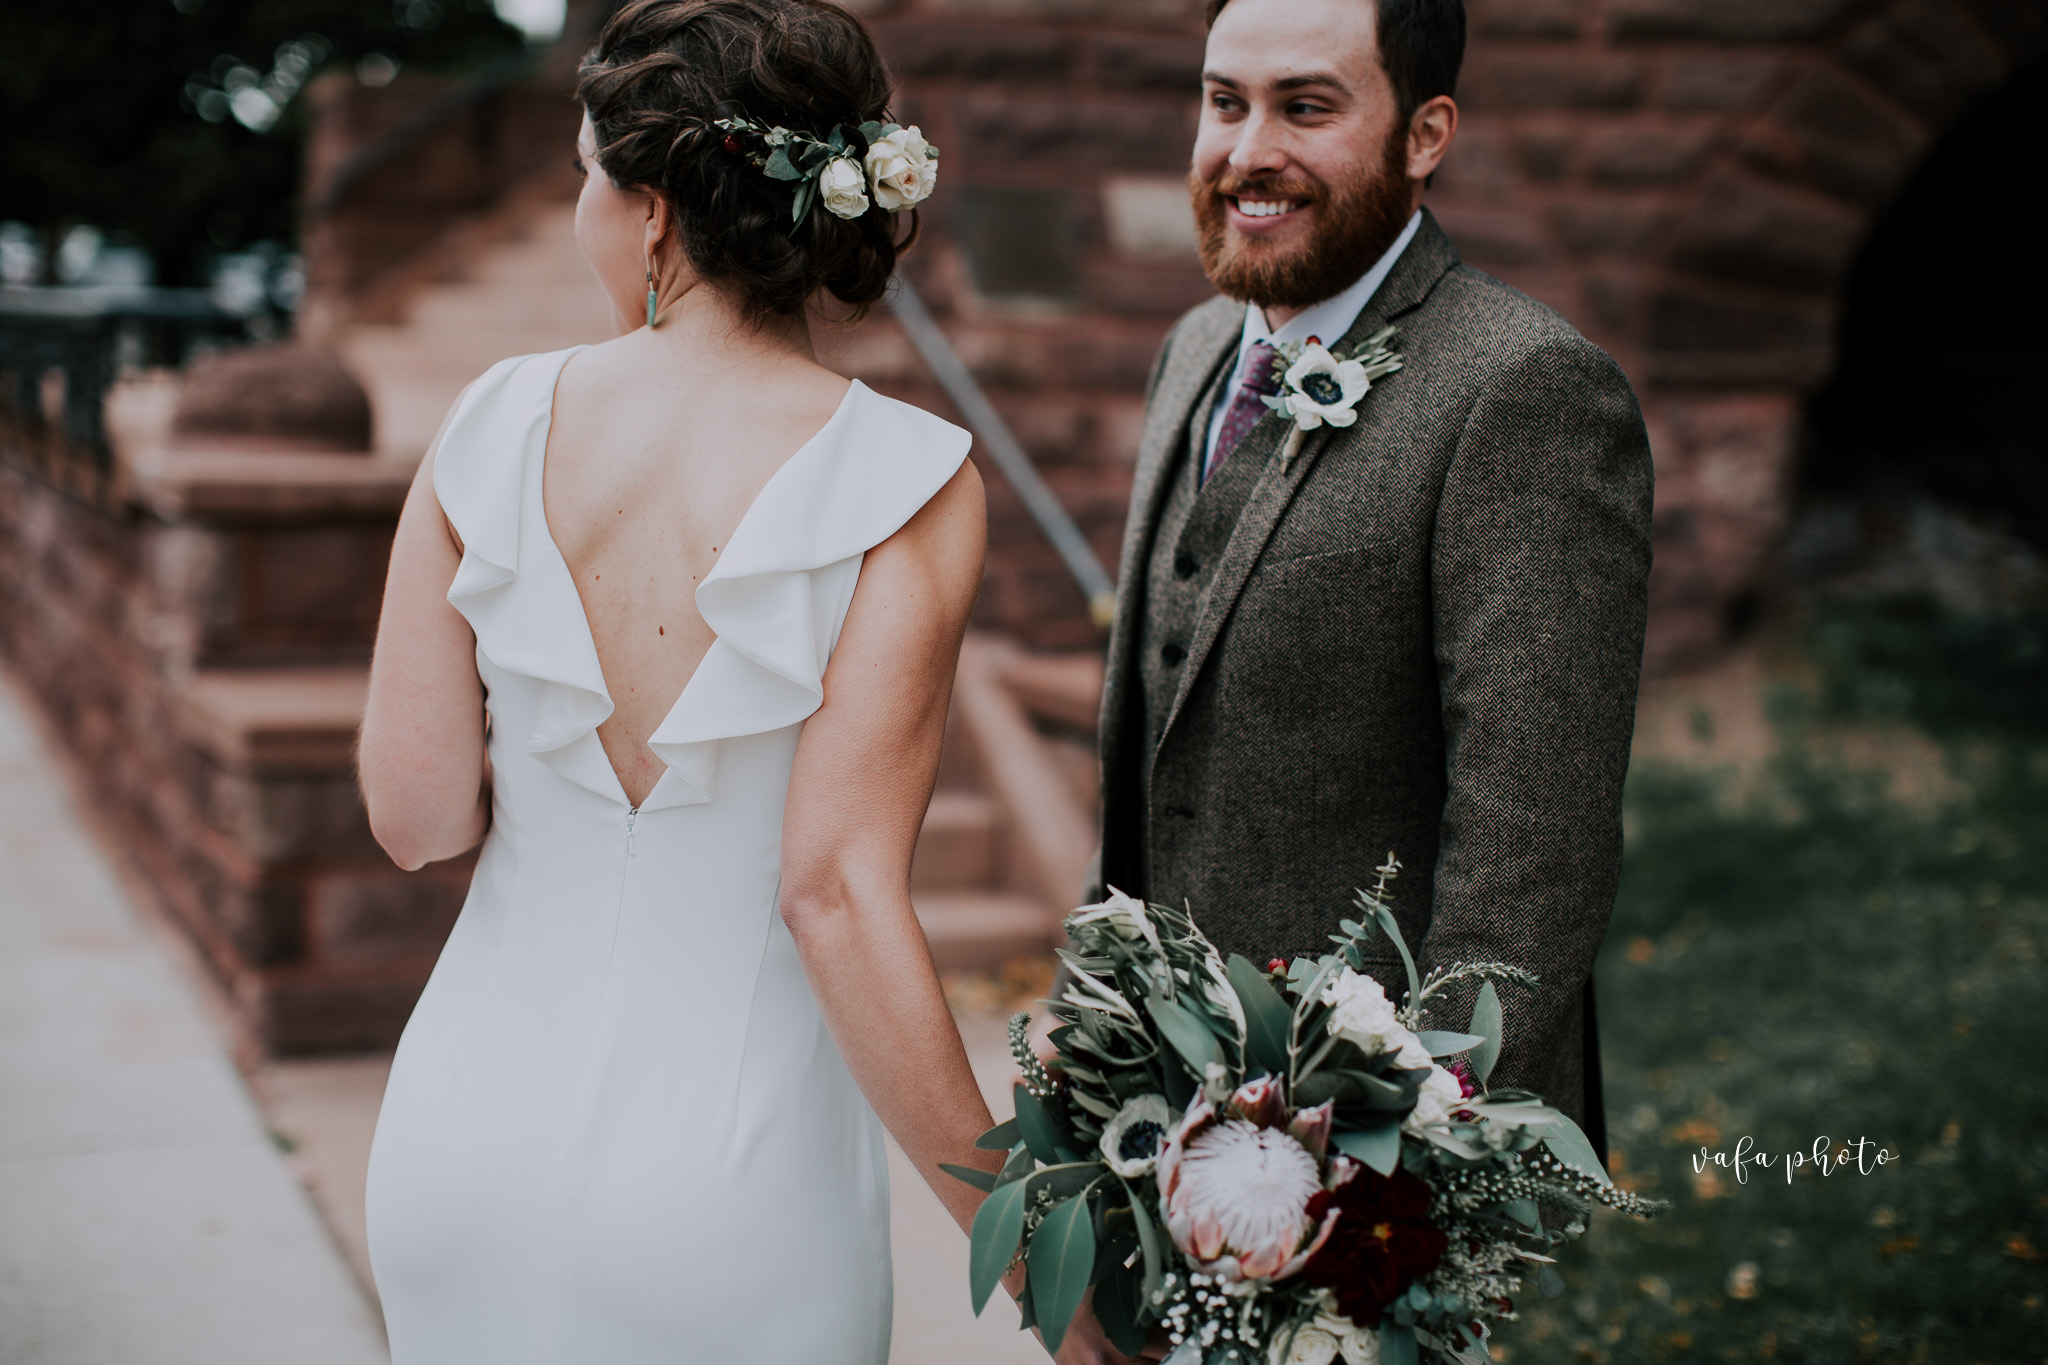 Little-Presque-Isle-Michigan-Wedding-Kim-Kyle-Vafa-Photo-537.jpg